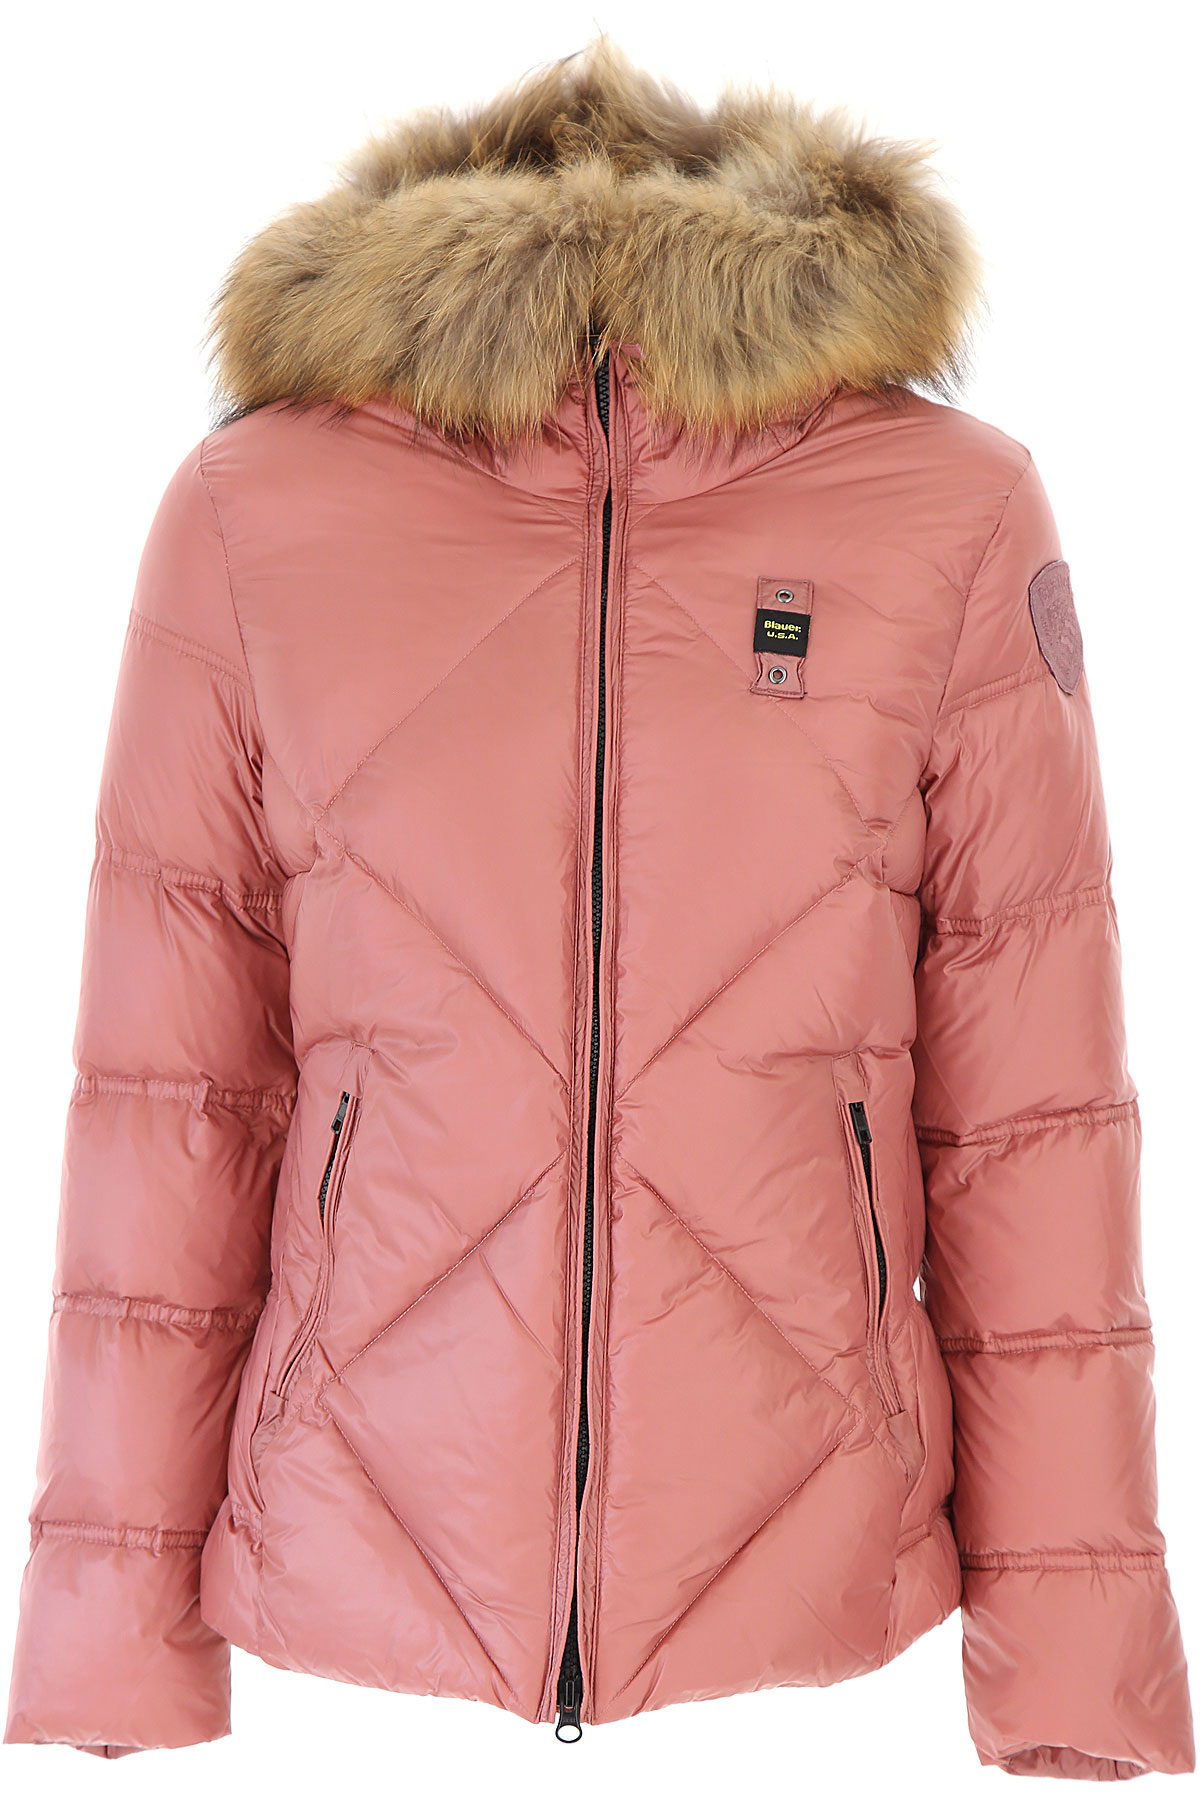 Blauer Down Jacket for Women, Puffer Ski Jacket On Sale, Bright Salmon, polyester, 2019, 2 4 6 8